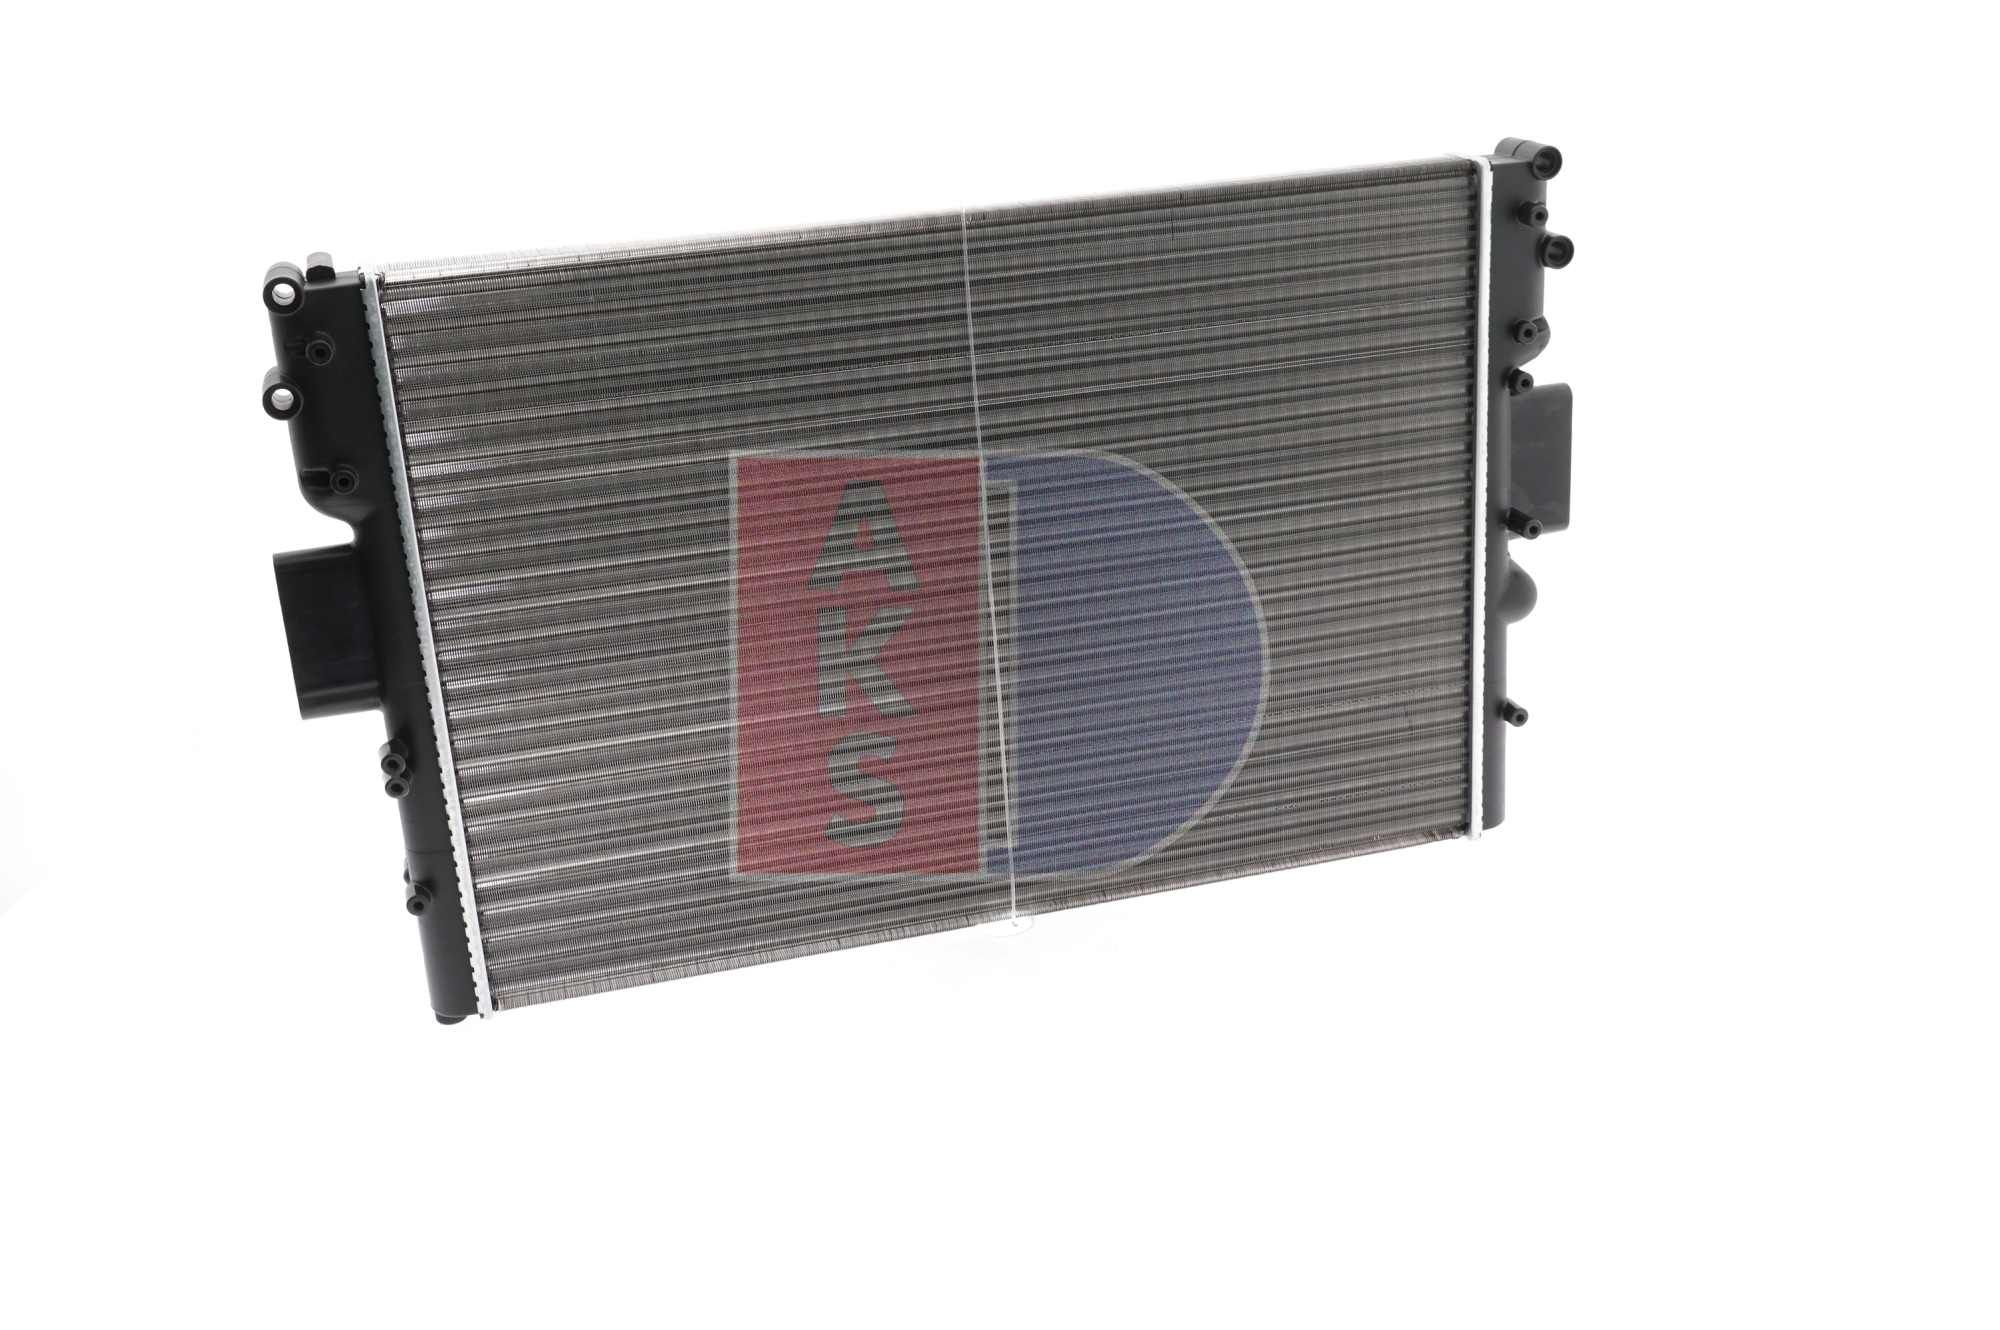 Kühler, Motorkühlung 400037N von AKS DASIS